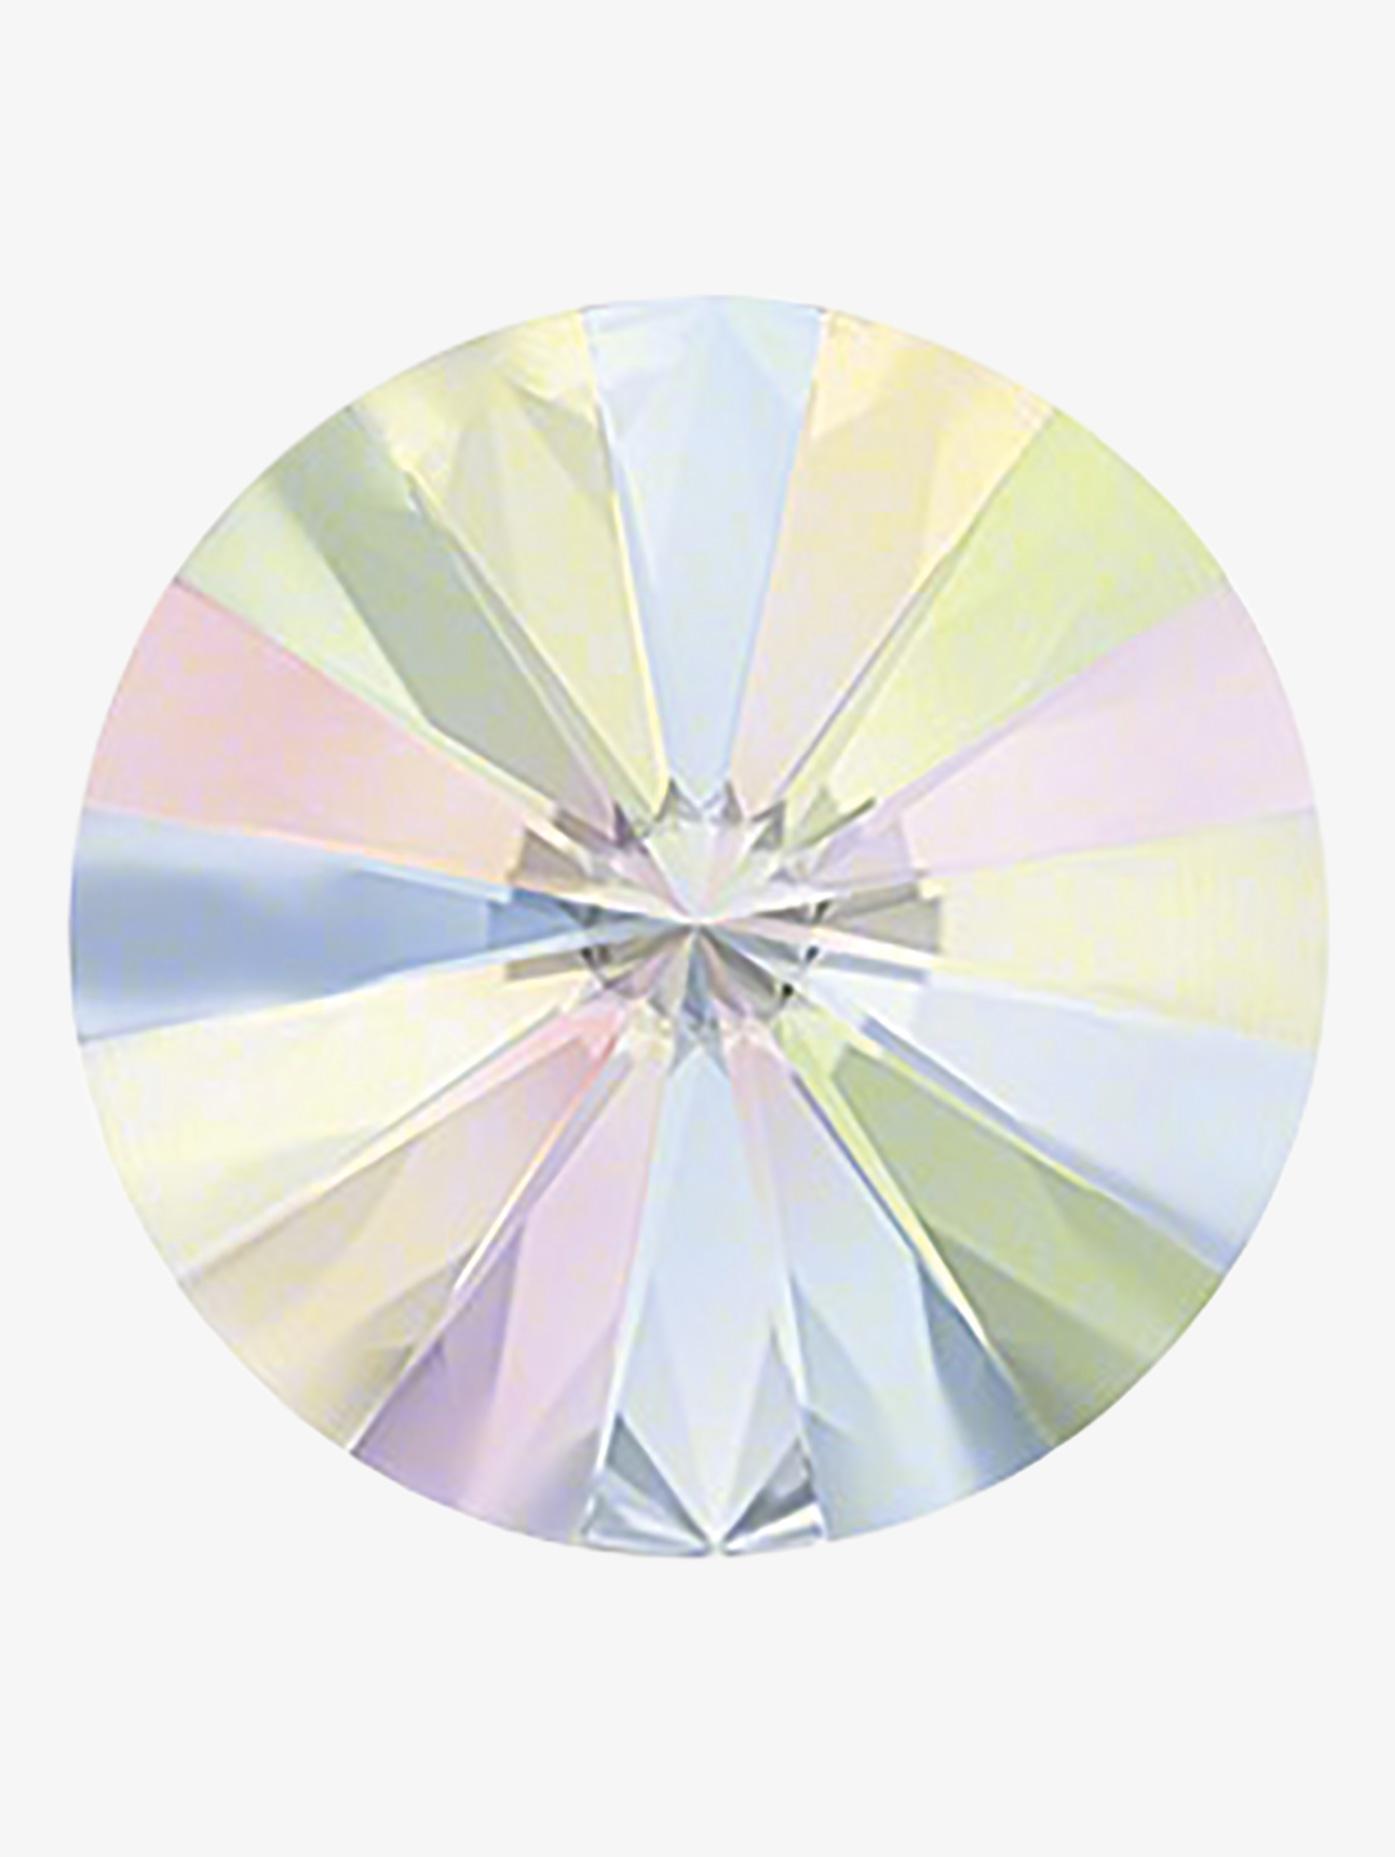 Rhinestones Unlimited Swarovski Crystal AB Jewel Cut Rivoli Flatback RU072